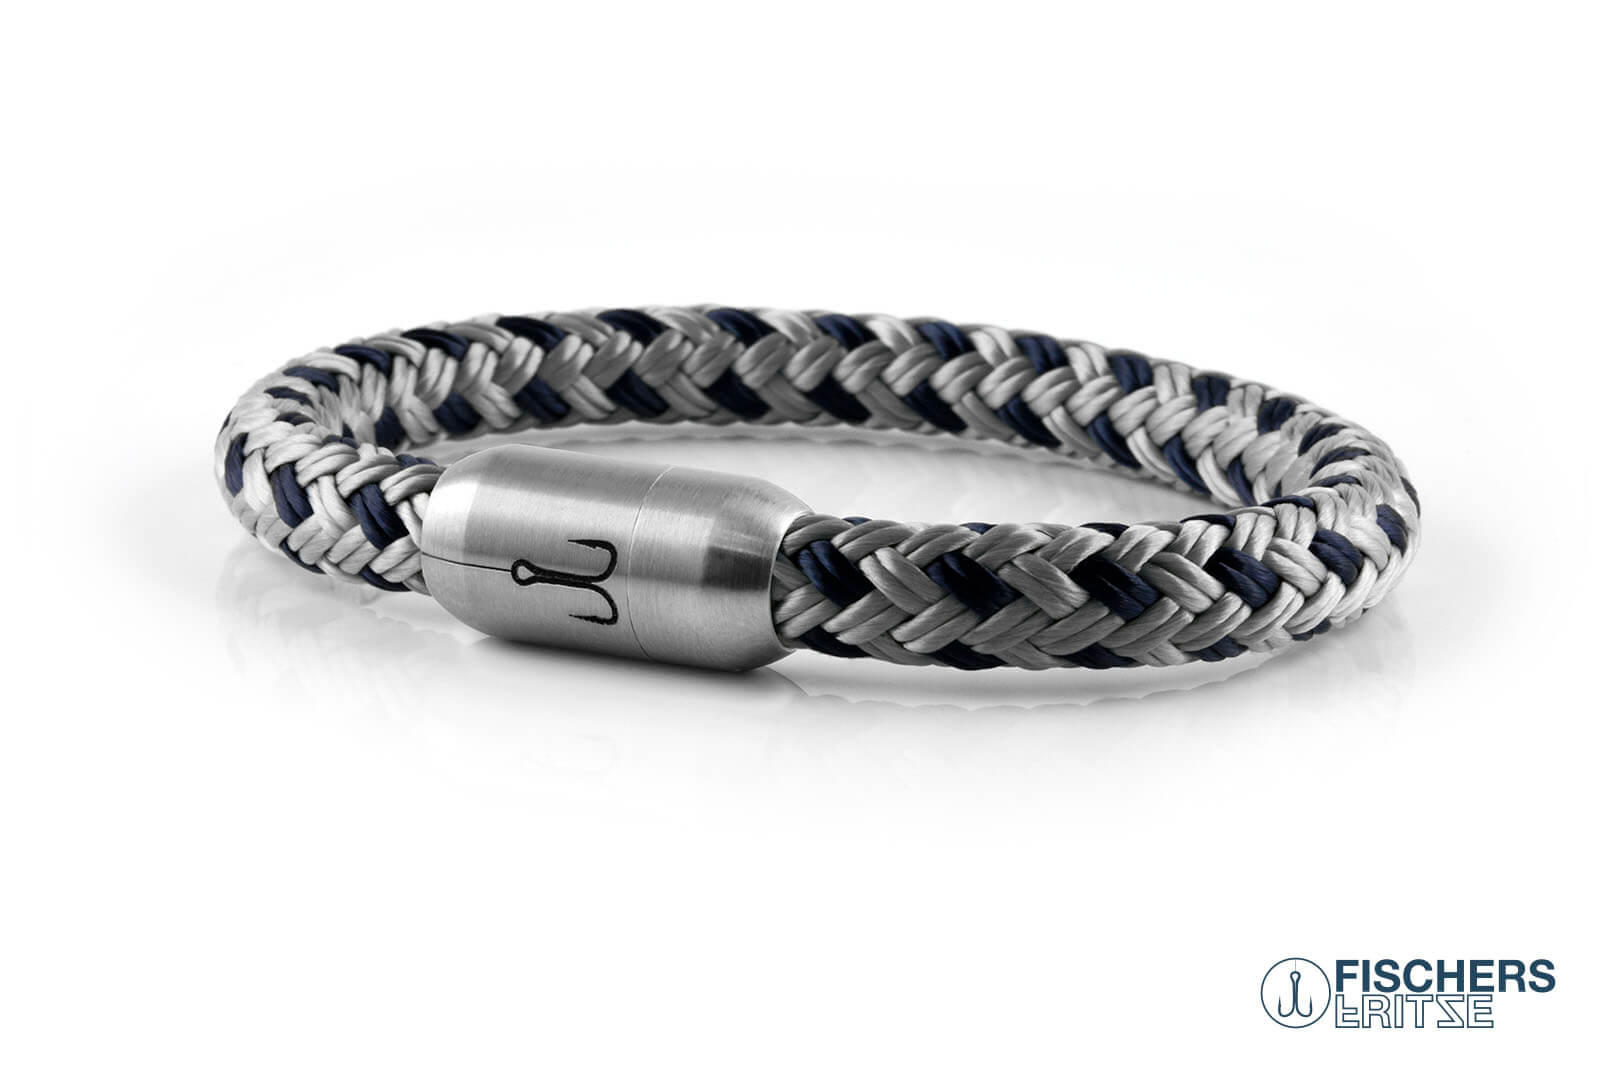 armband-fischers-fritze-makrele-grau-blau-segeltau